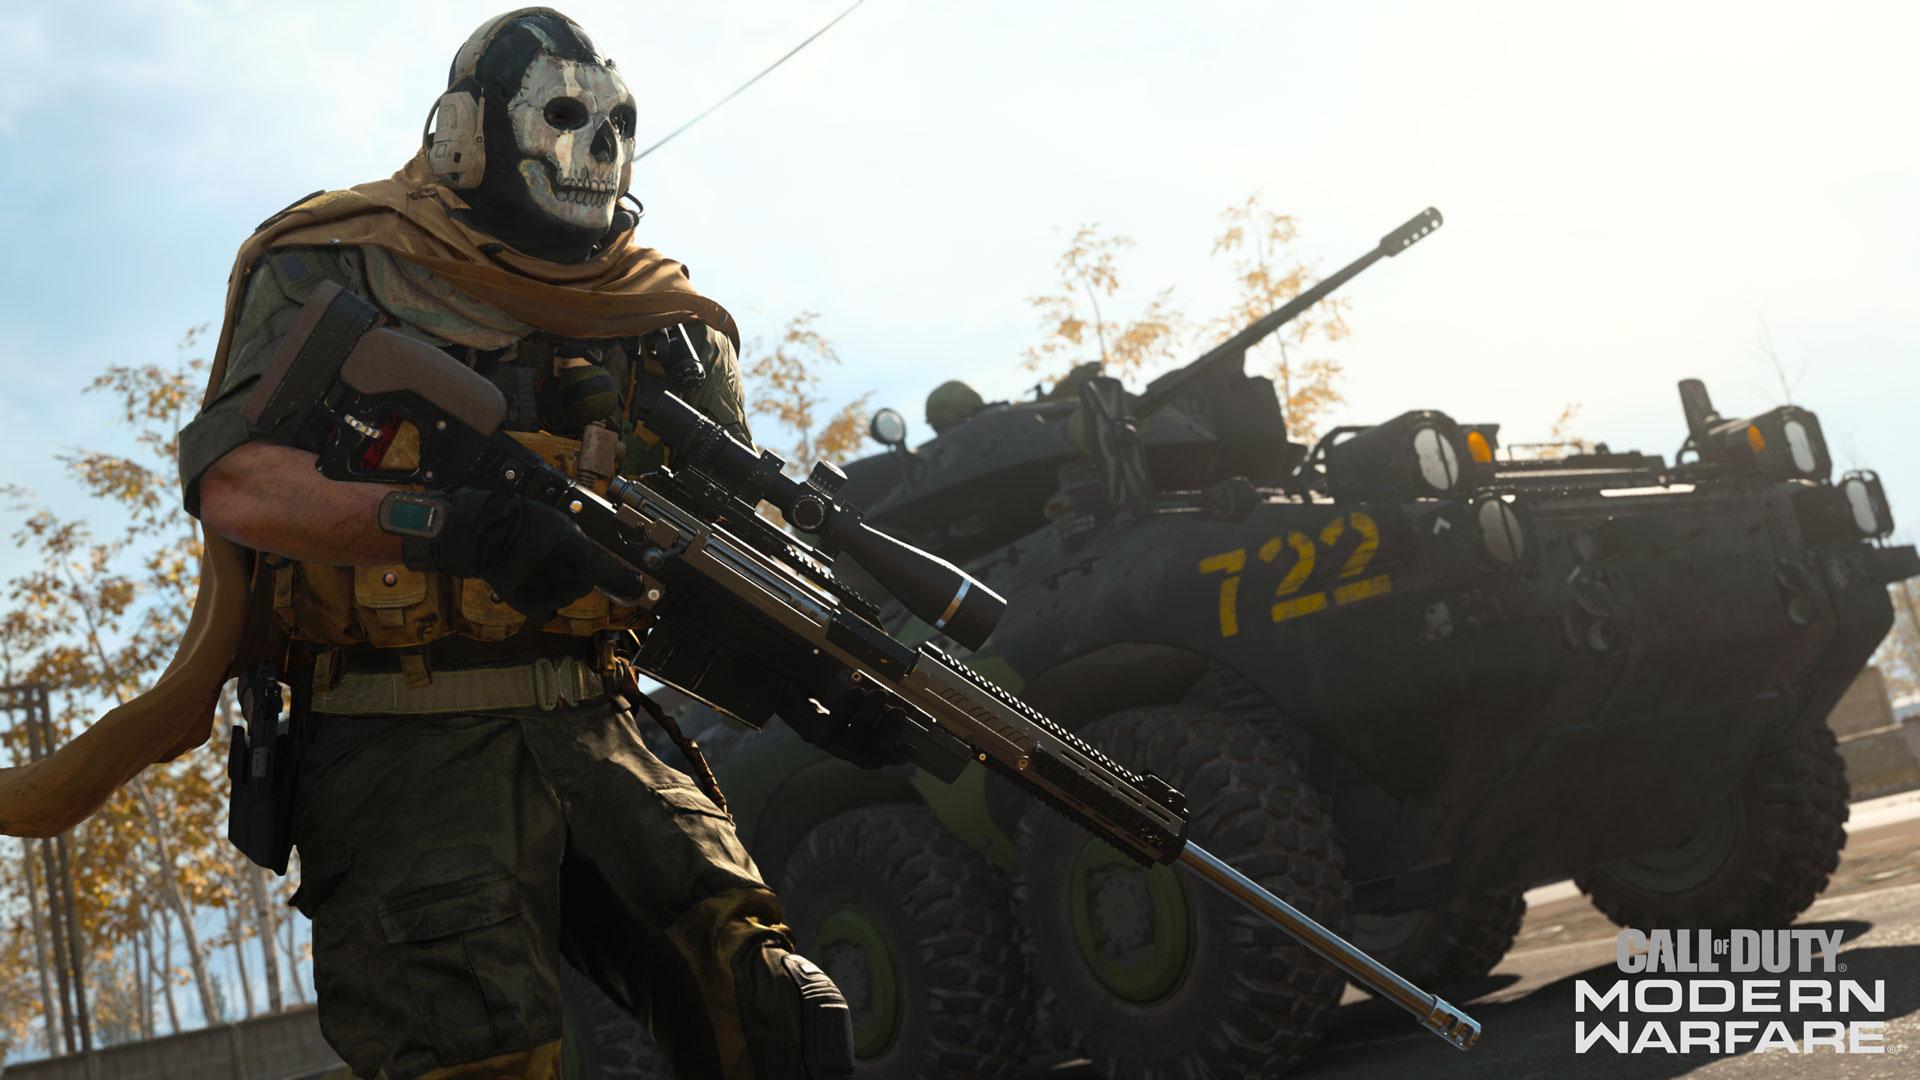 Call of Duty : Modern Warfare, la saison 2 maintenant disponible Raw_jf10